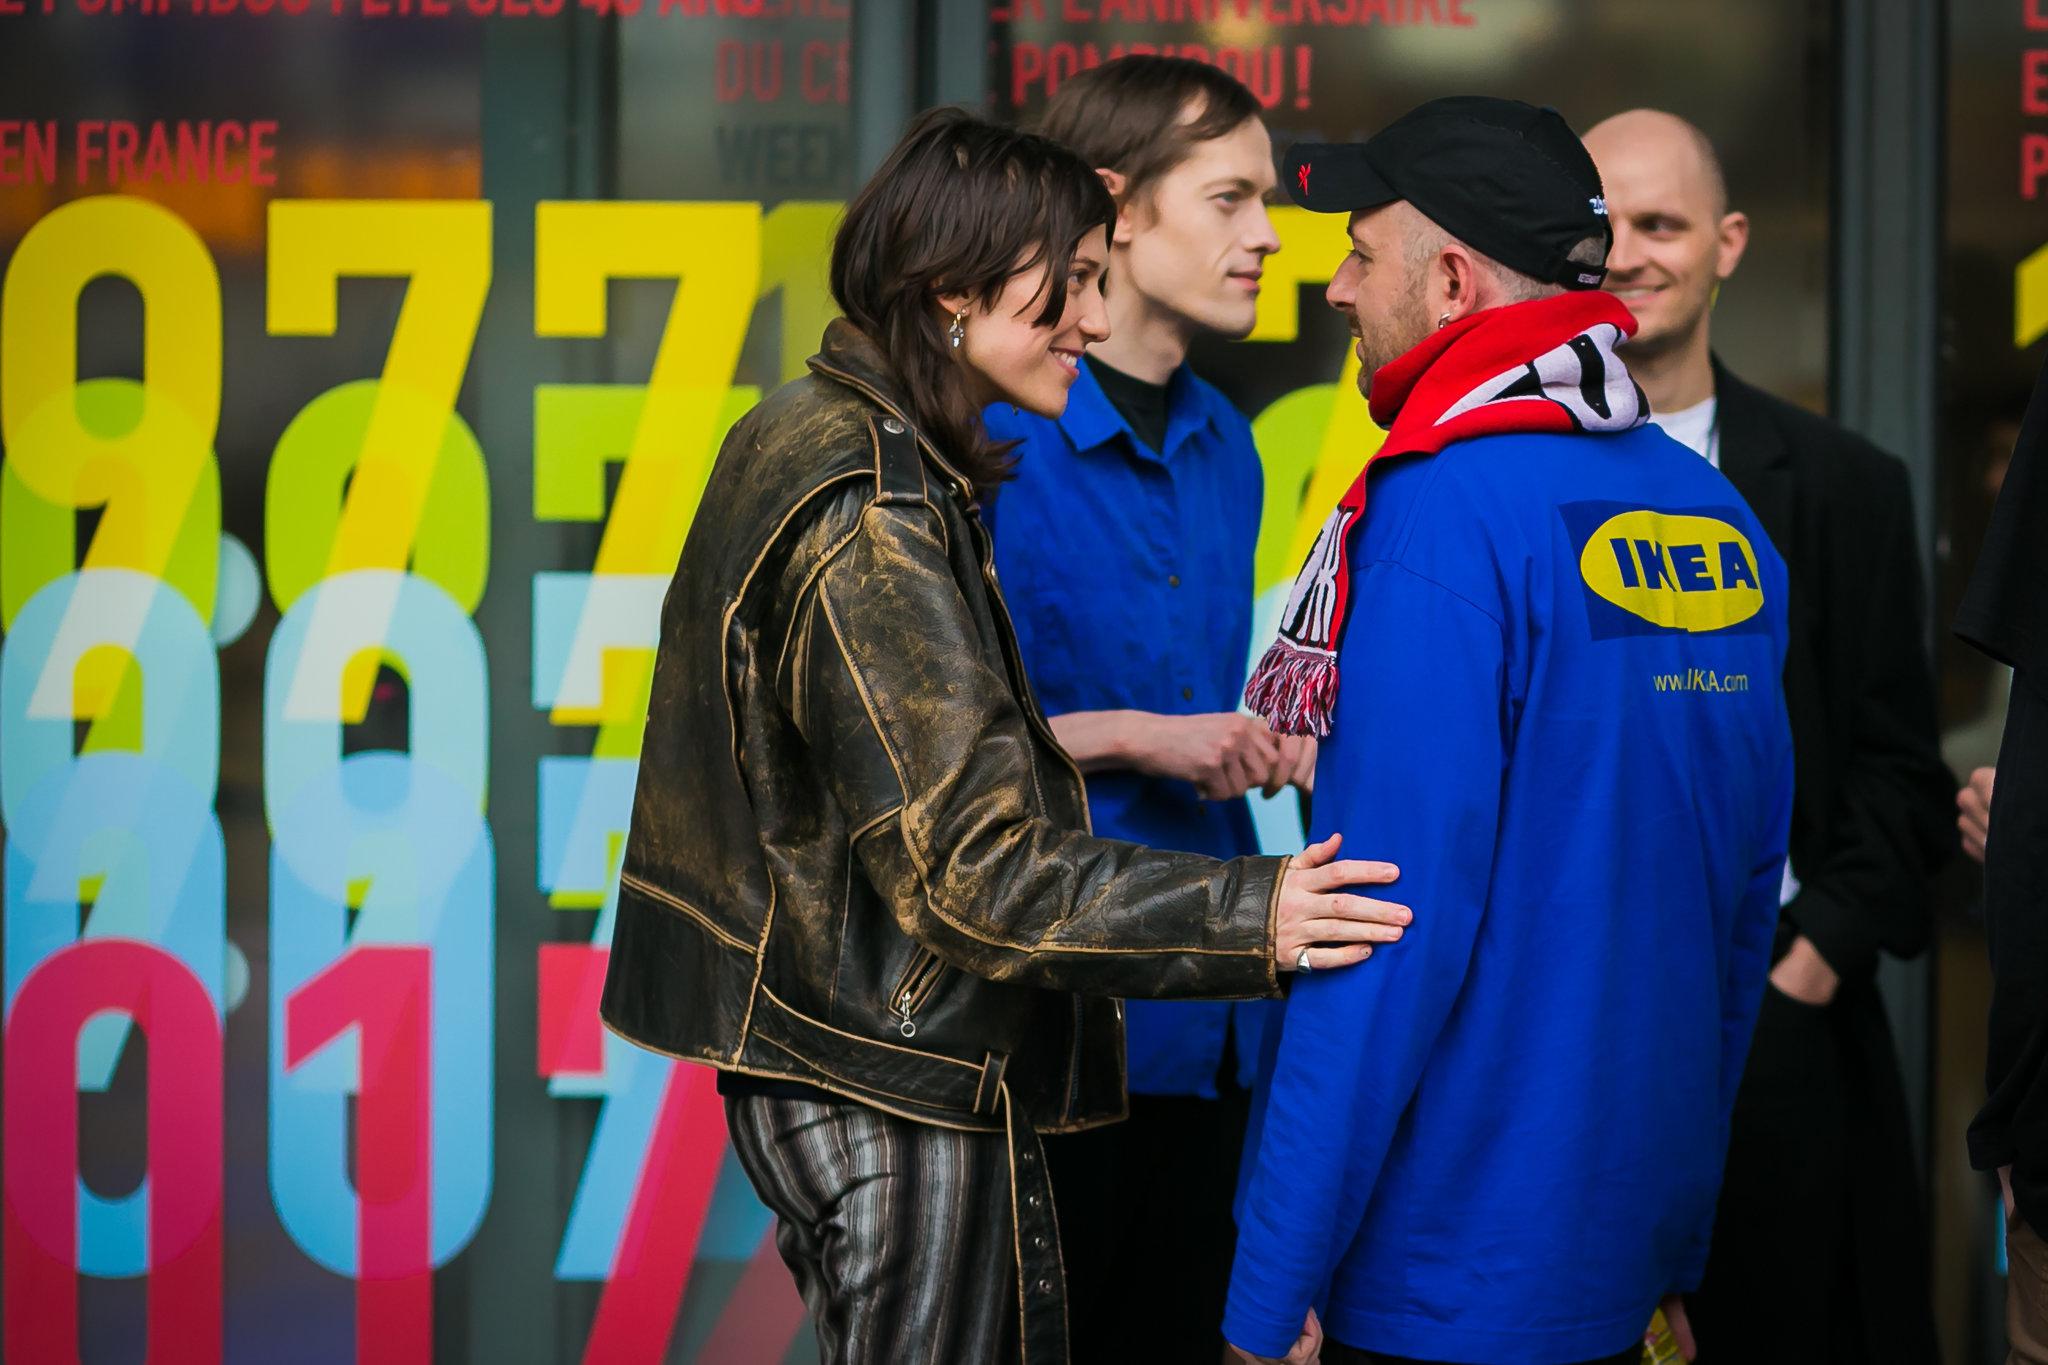 Demna Gvasalia之前穿上IKEA的外套,似乎早有預告?